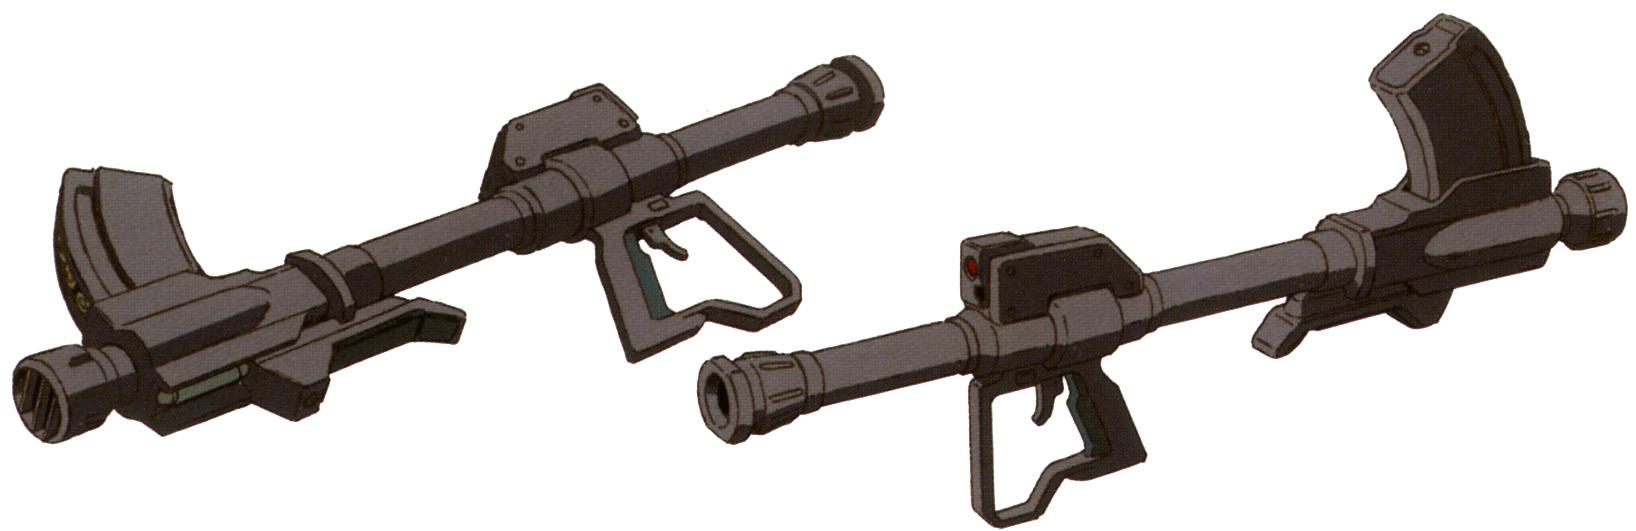 File:Rx-79g-bazookagun.jpg